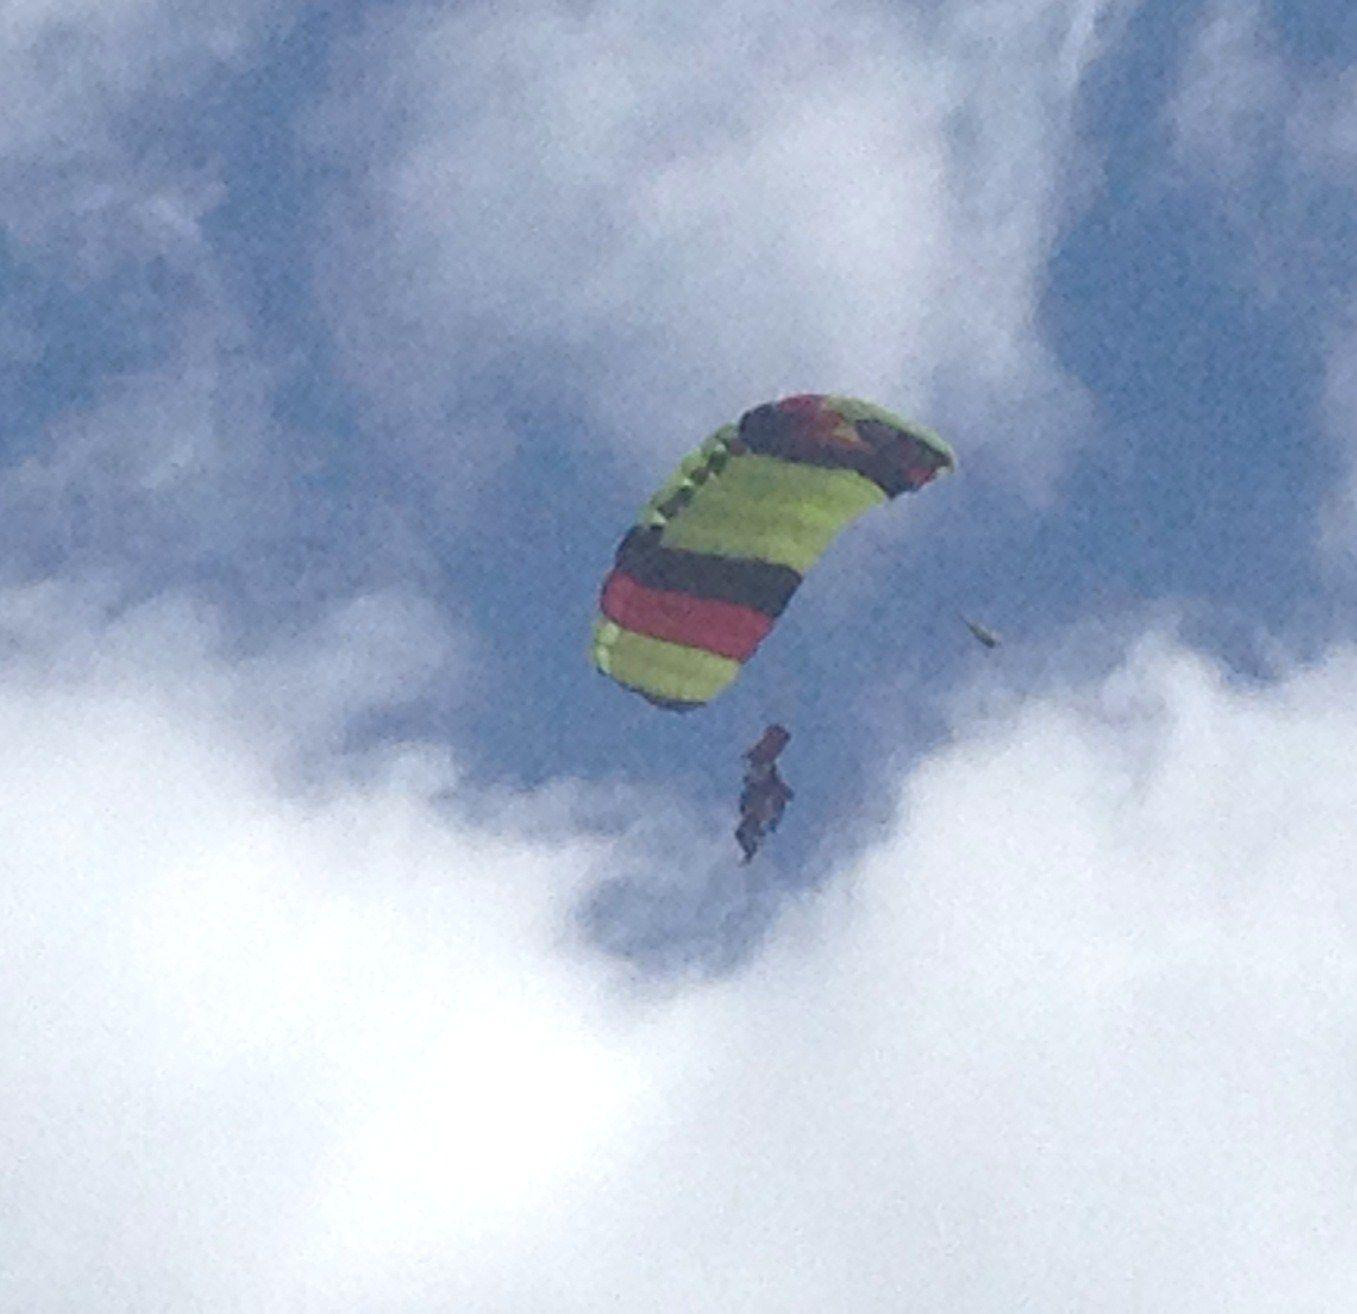 Sky S The Limit Poconos Places To Stay Skydiving Dog Sledding Poconos